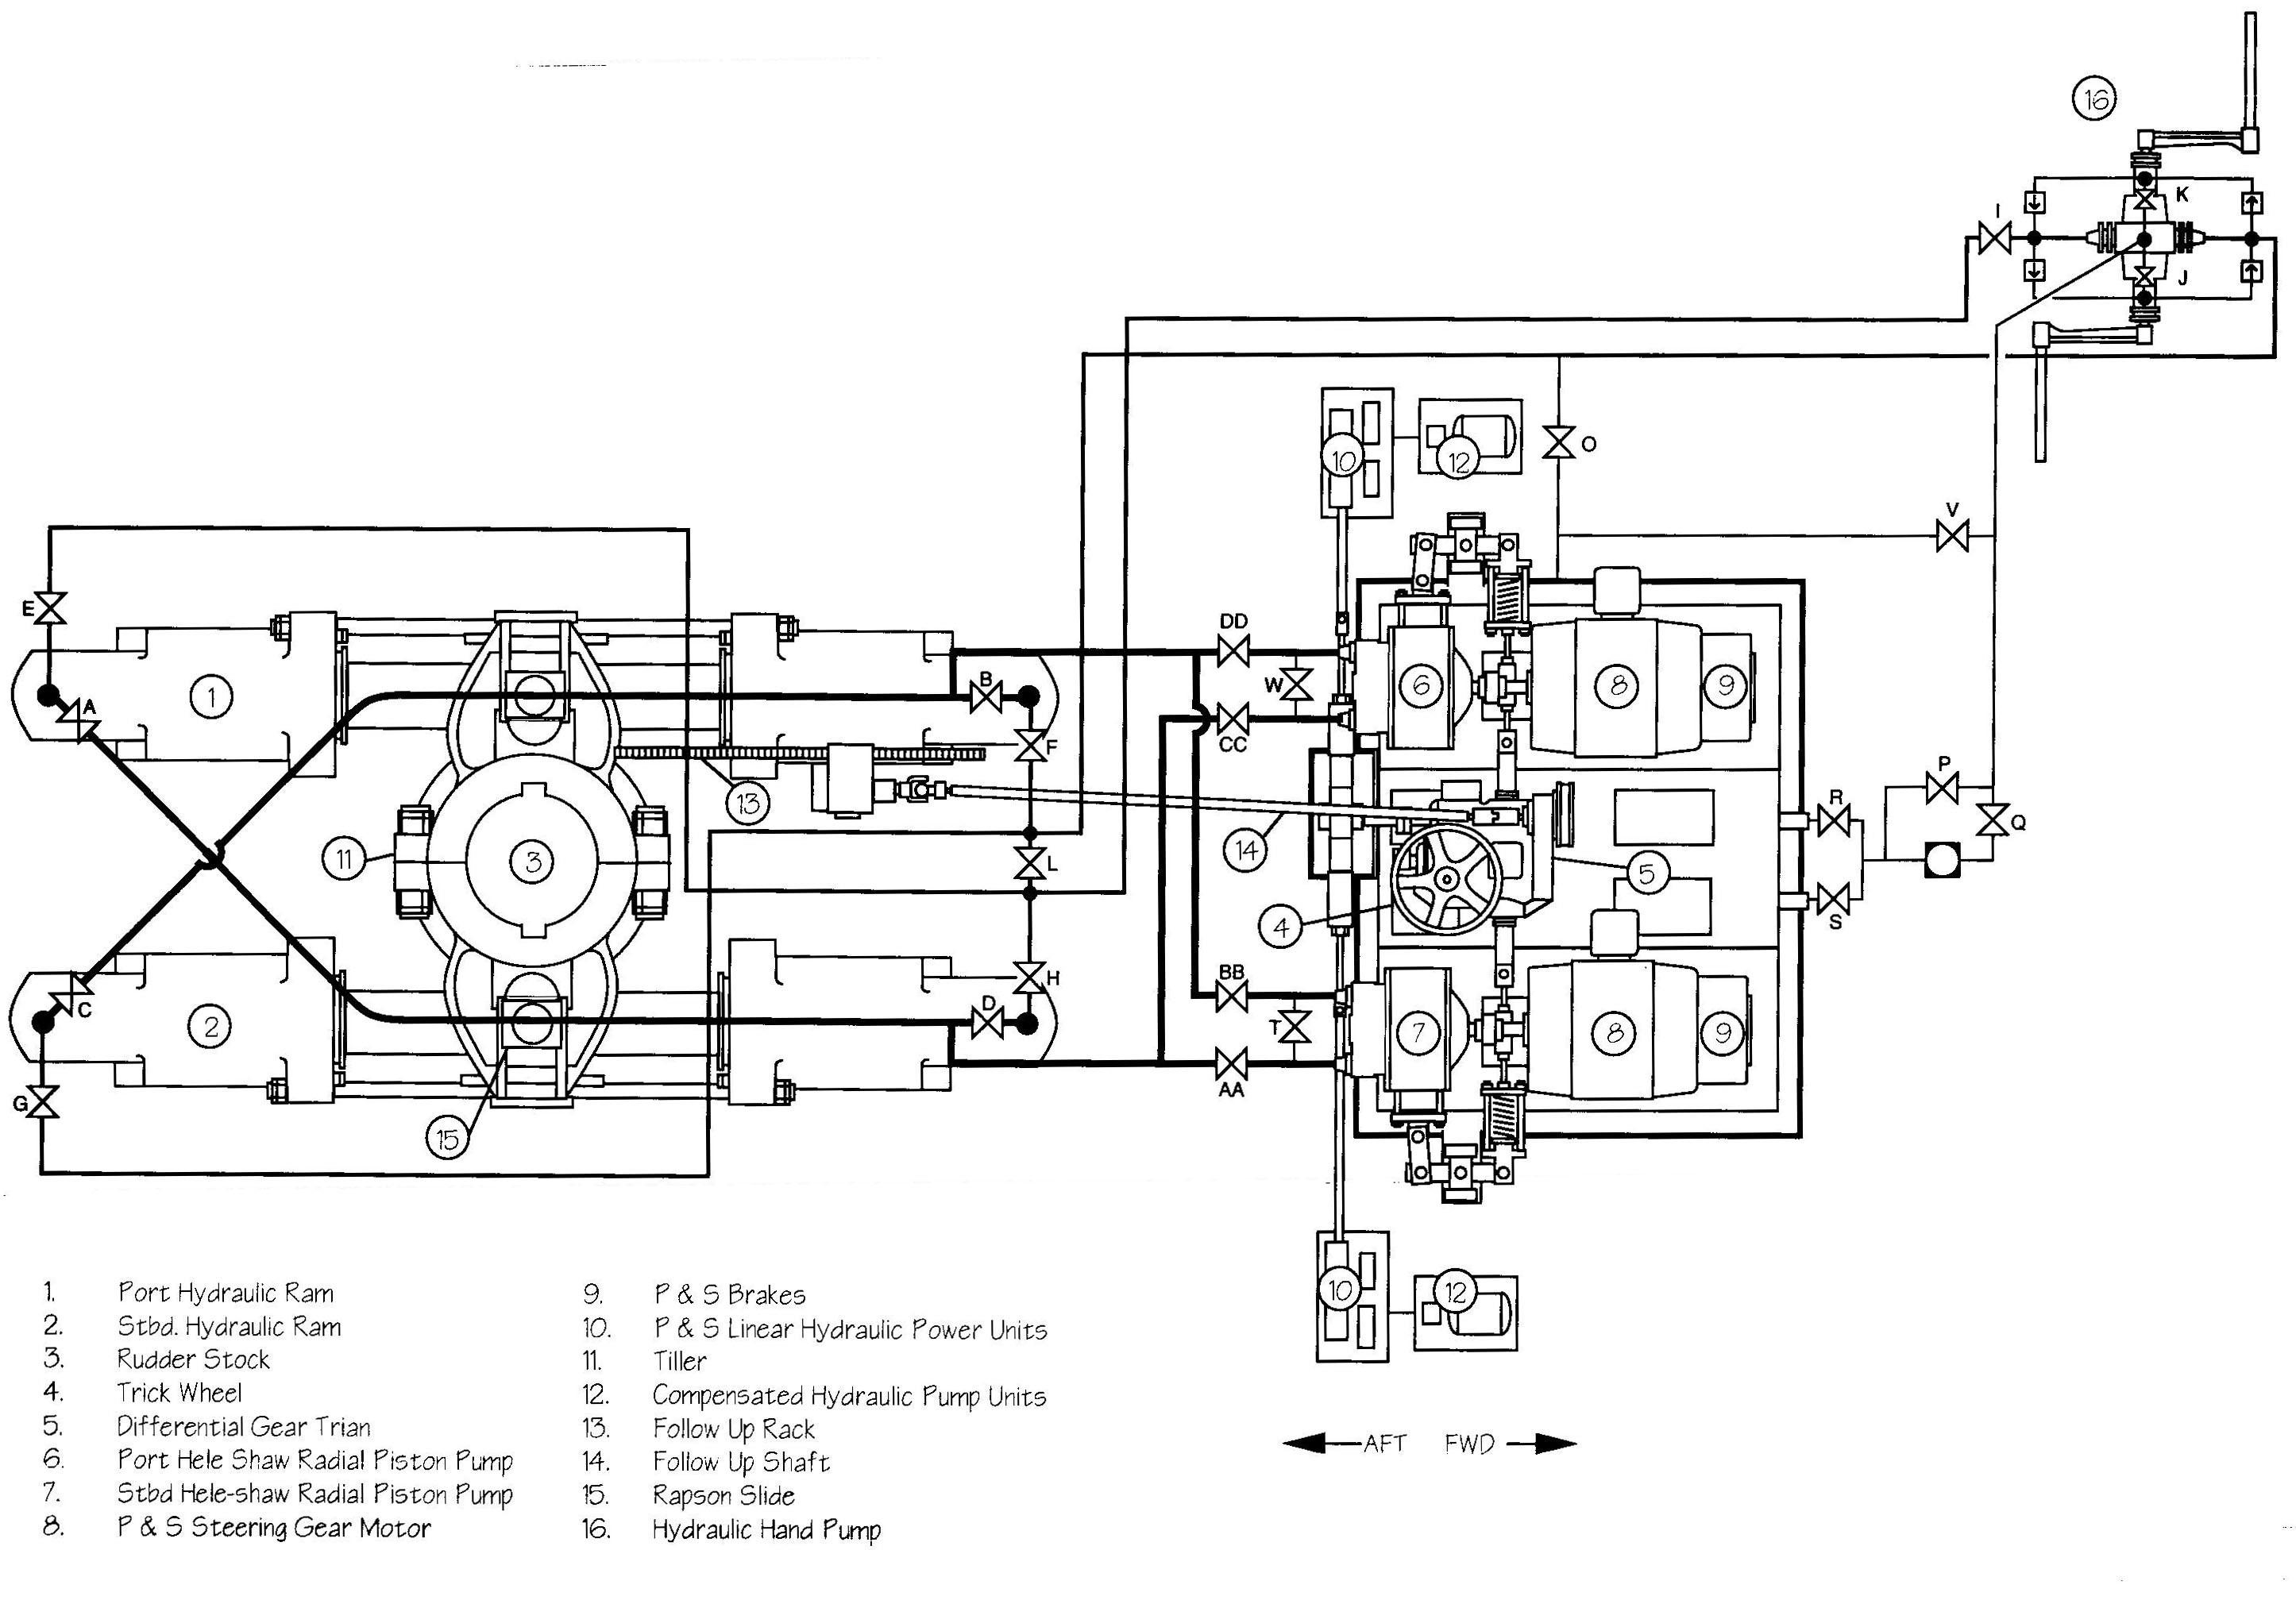 Hydraulic Pump Diagram Elegant Emergency Door Release